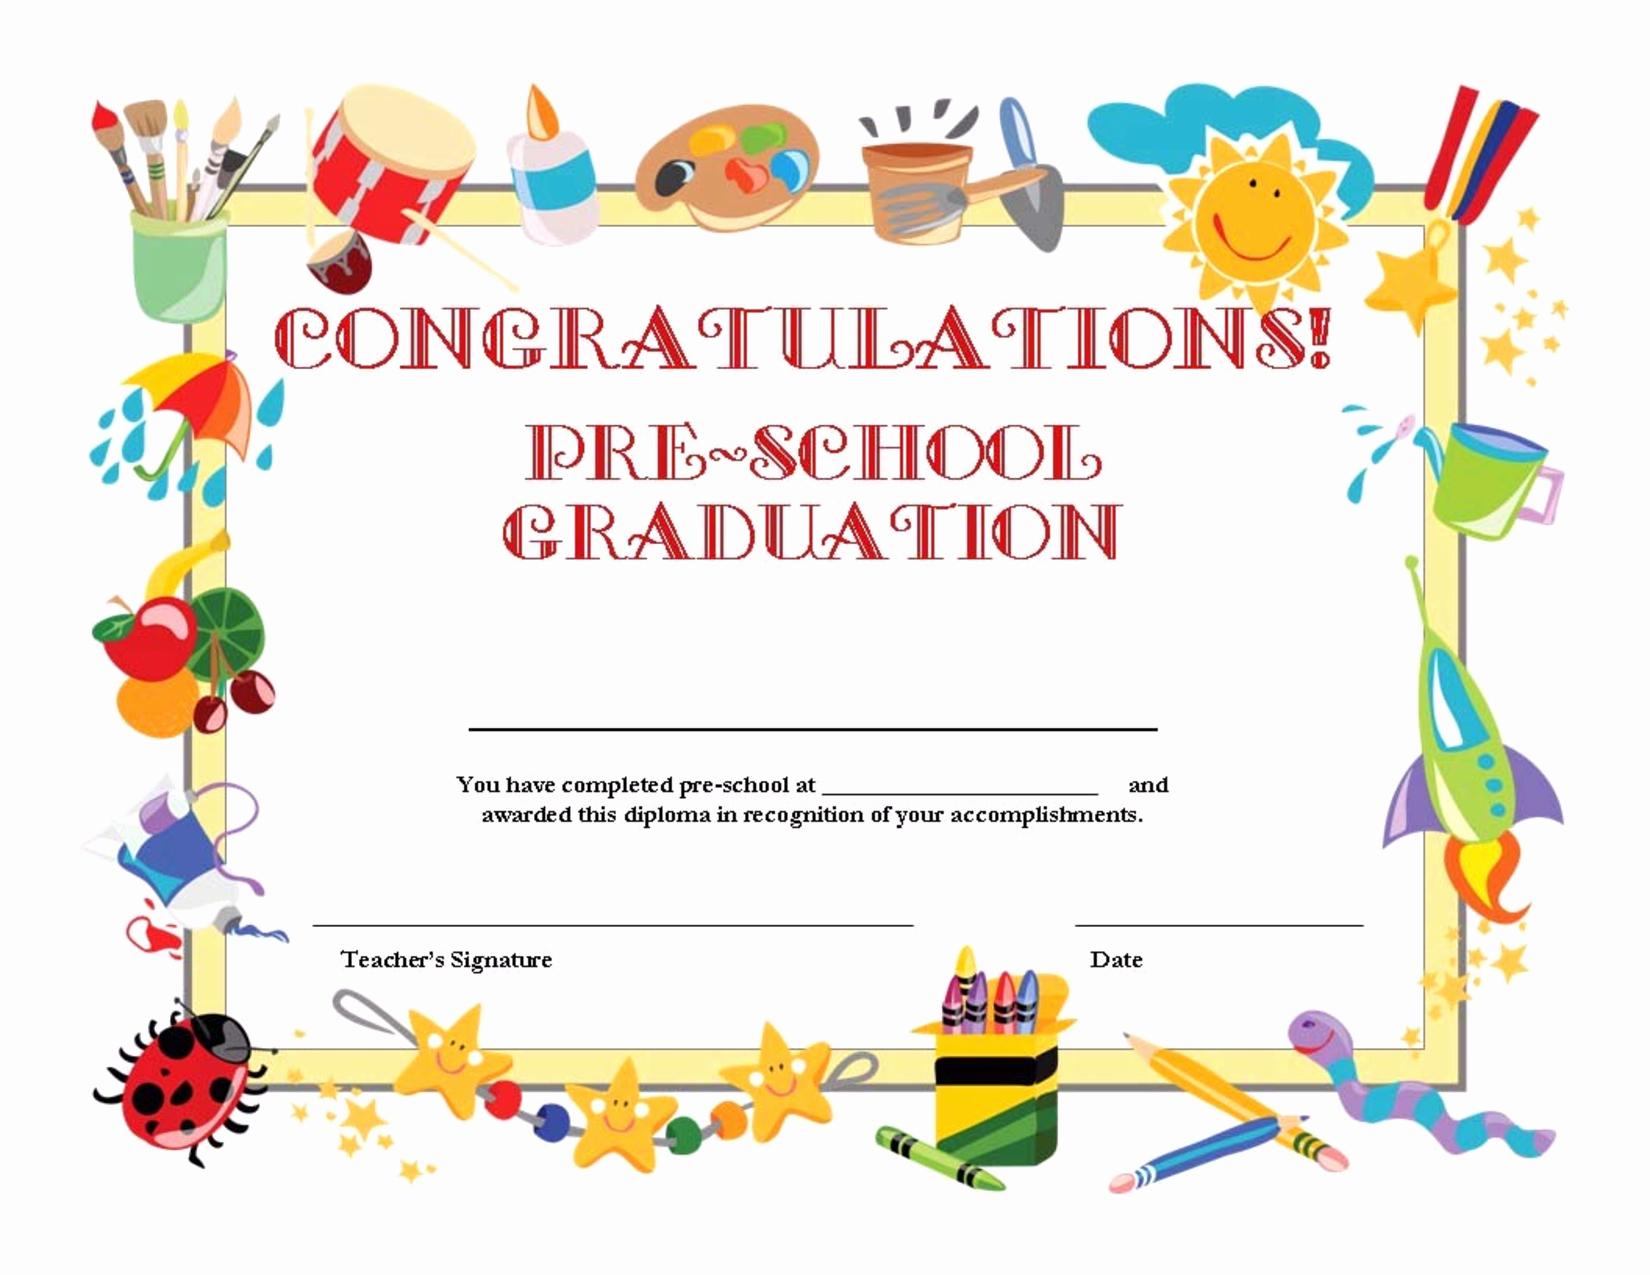 Preschool Graduation Programs Template New Preschool Graduation Certificate Template Free